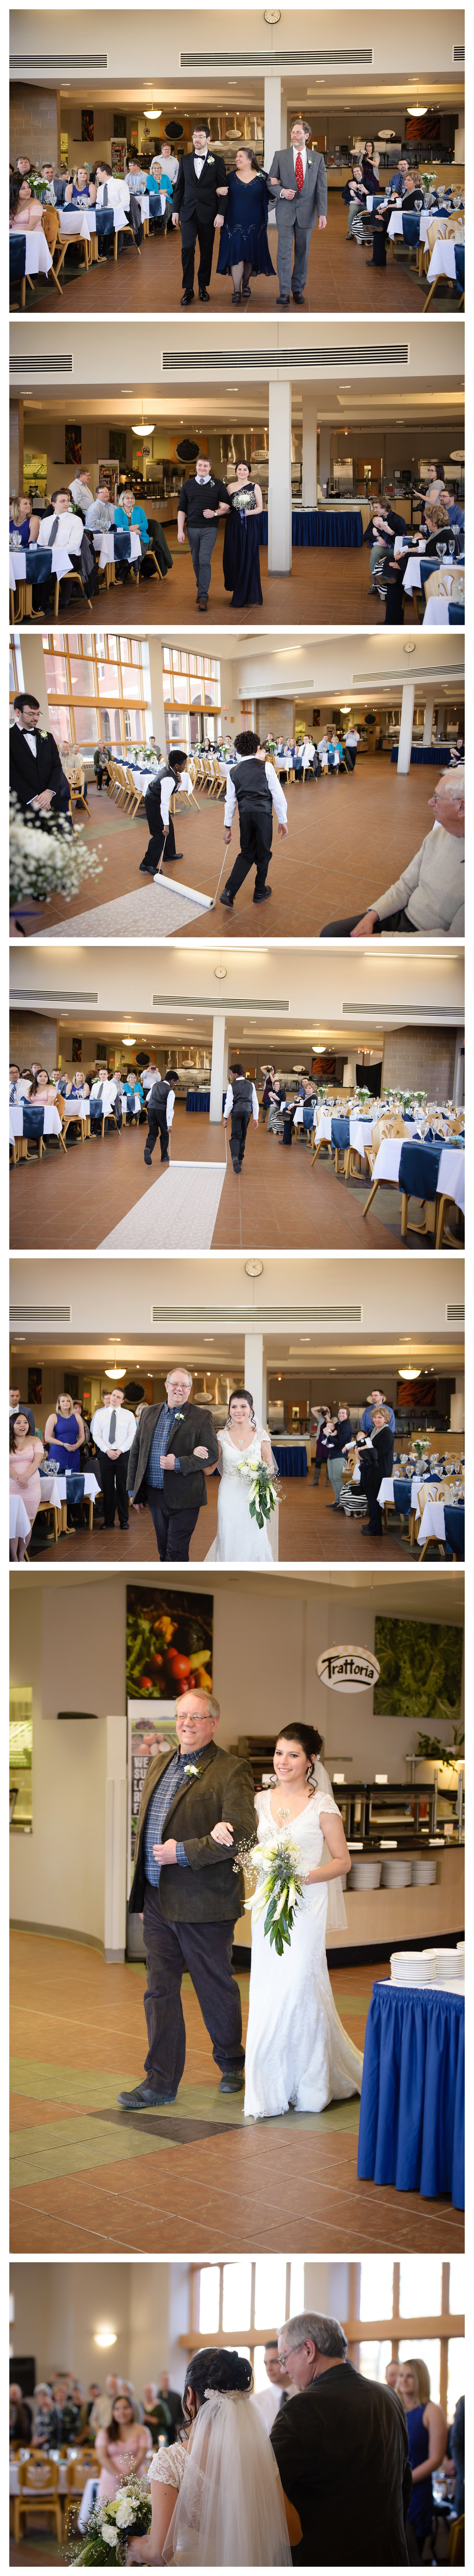 ashland wedding photographer iron river brule wisconsin ps 139 photography jen jensen_0130.jpg